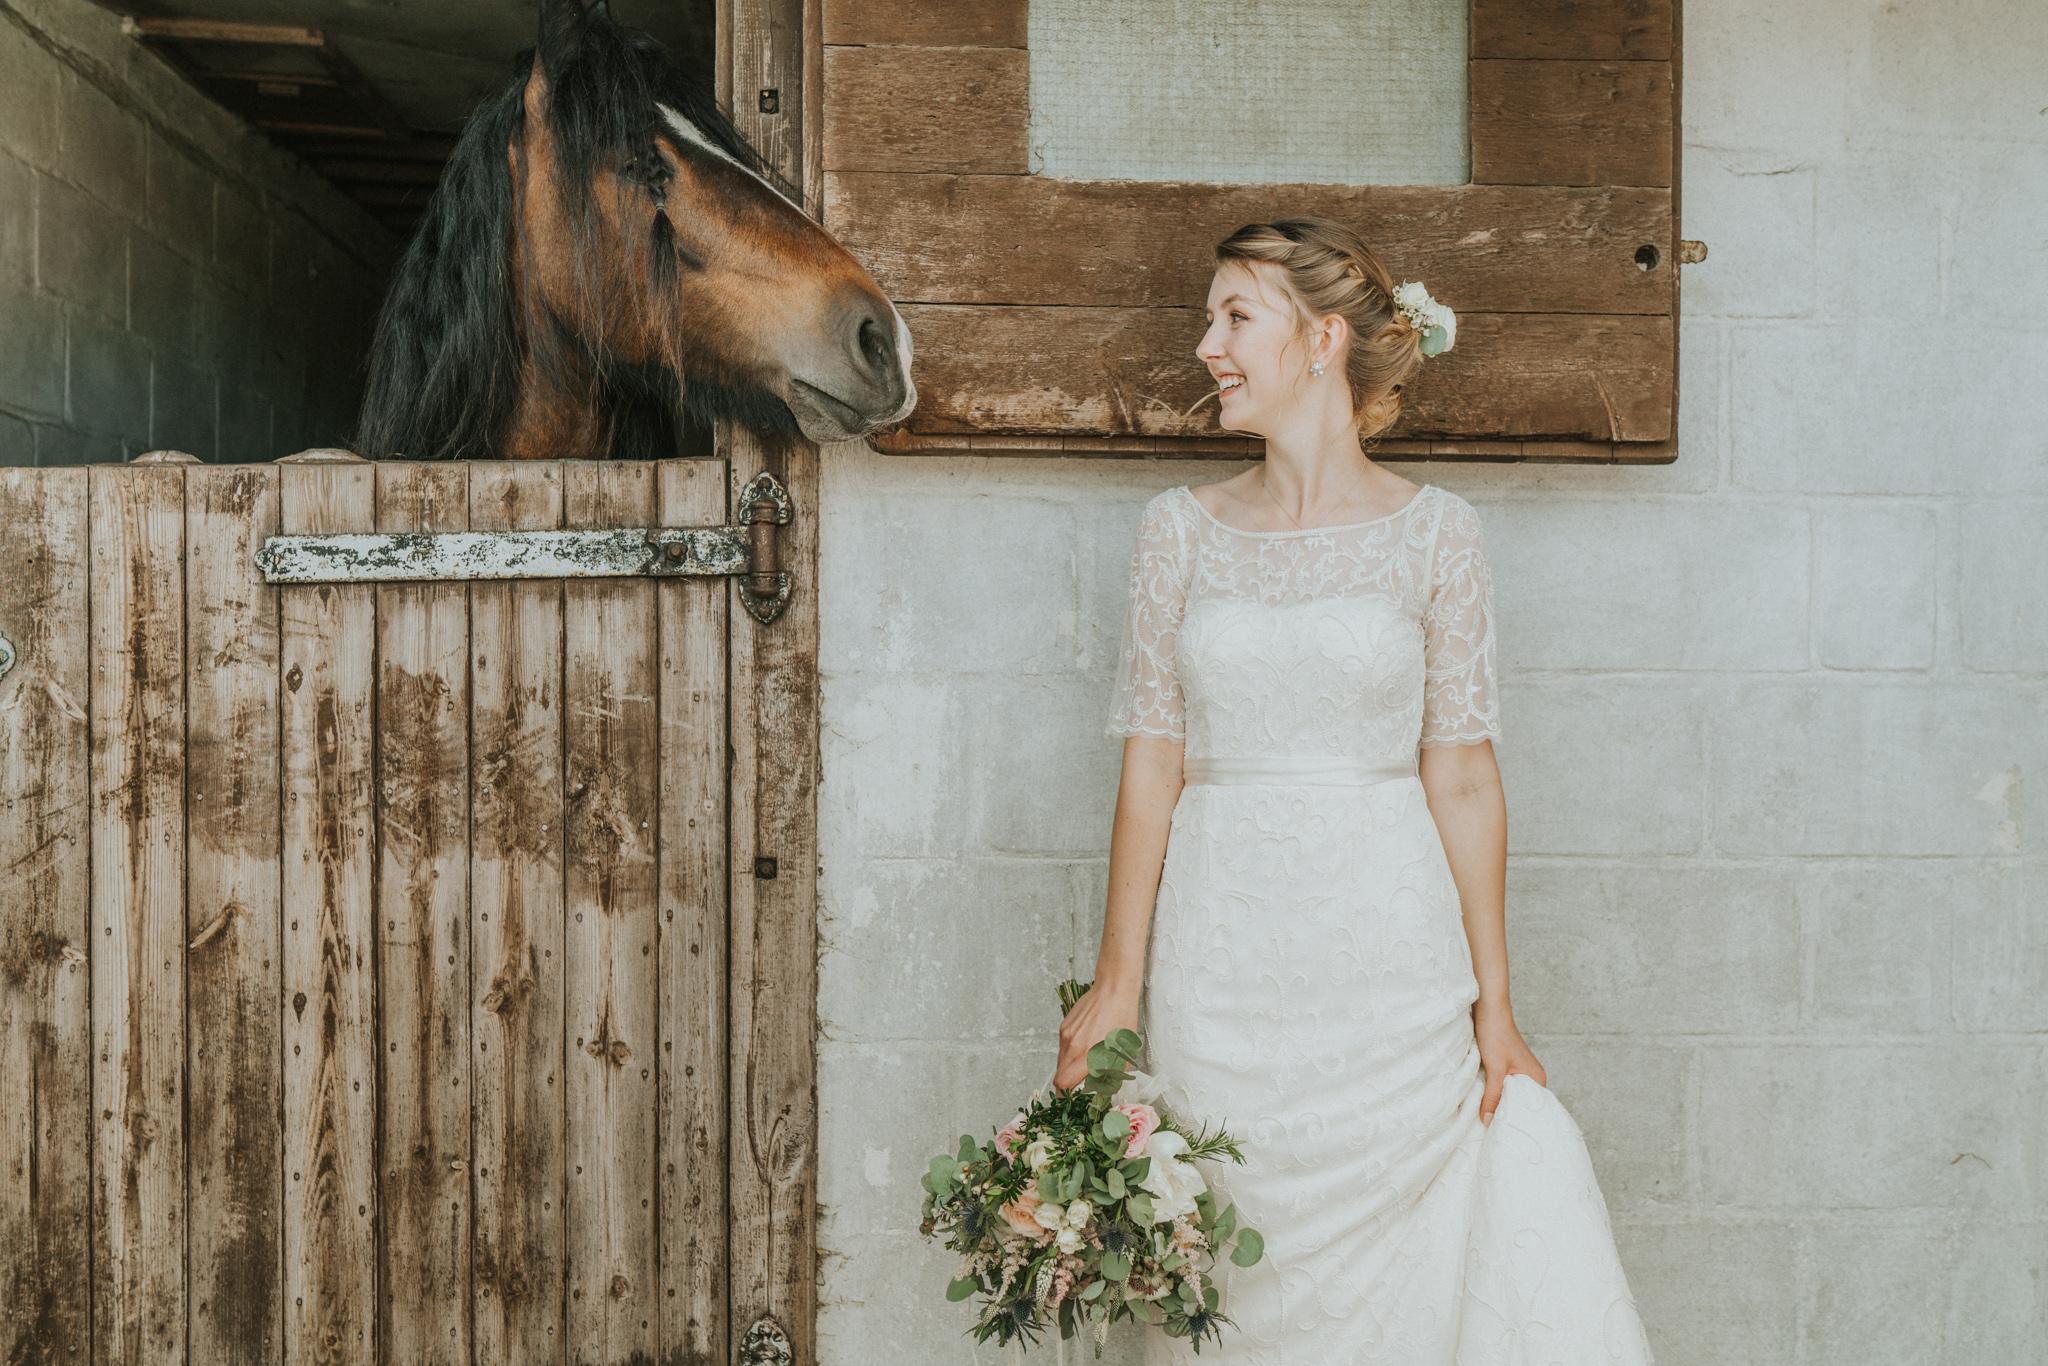 Jess-and-Tom-Norfolk-Alternative-Wedding-Essex-Wedding-Photographer-Grace-Elizabeth-20.jpg